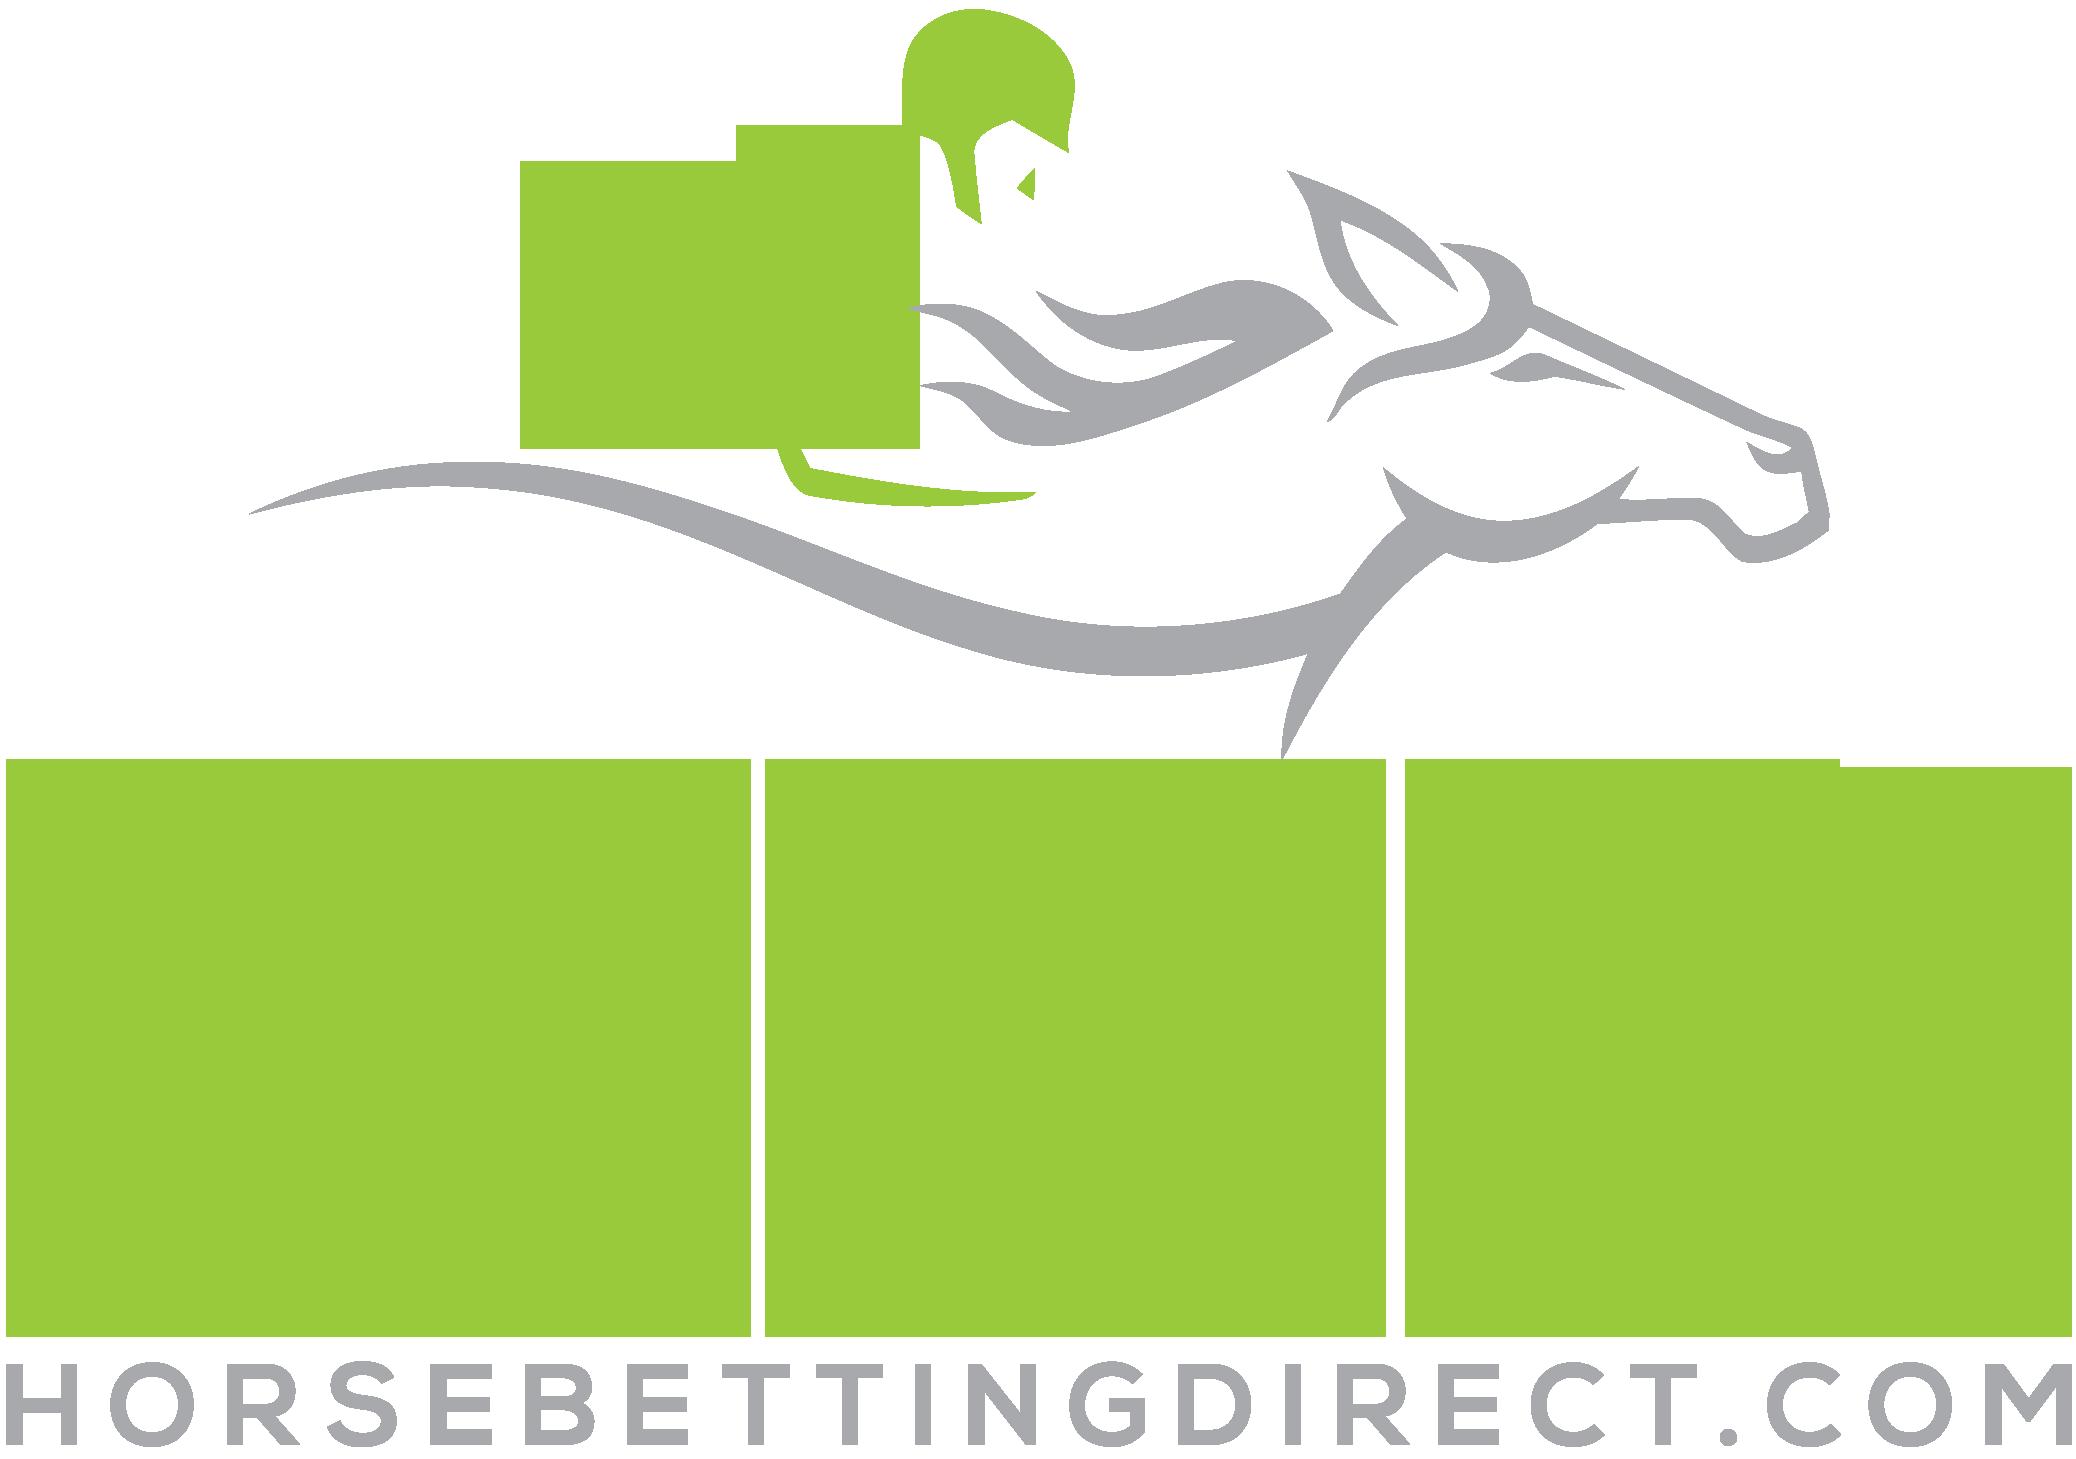 Horse Betting Direct logo